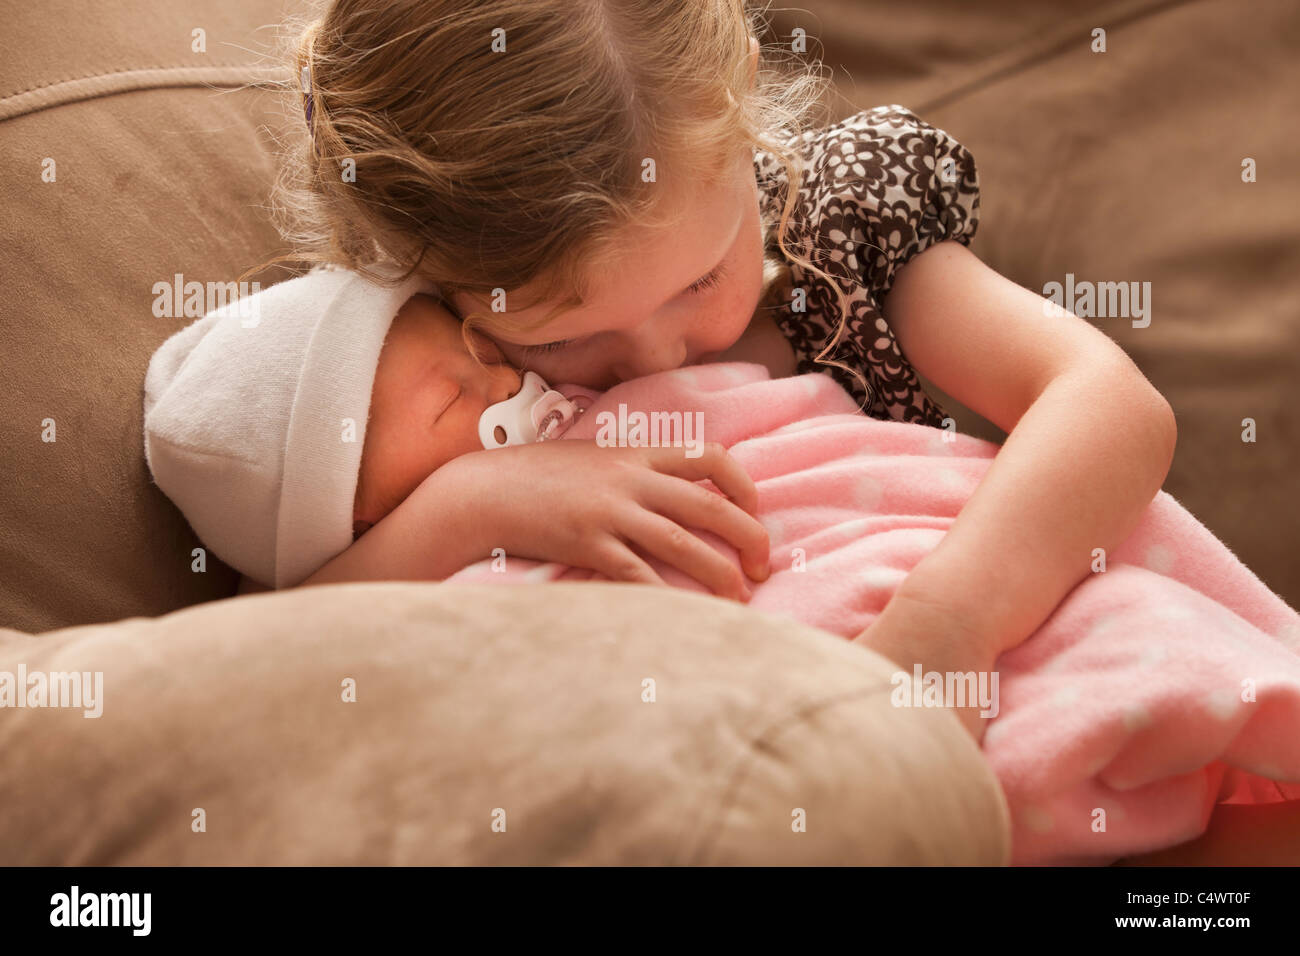 USA, Utah, Lehi, Mädchen (2-3) umfassende Babyschwester auf sofa Stockbild